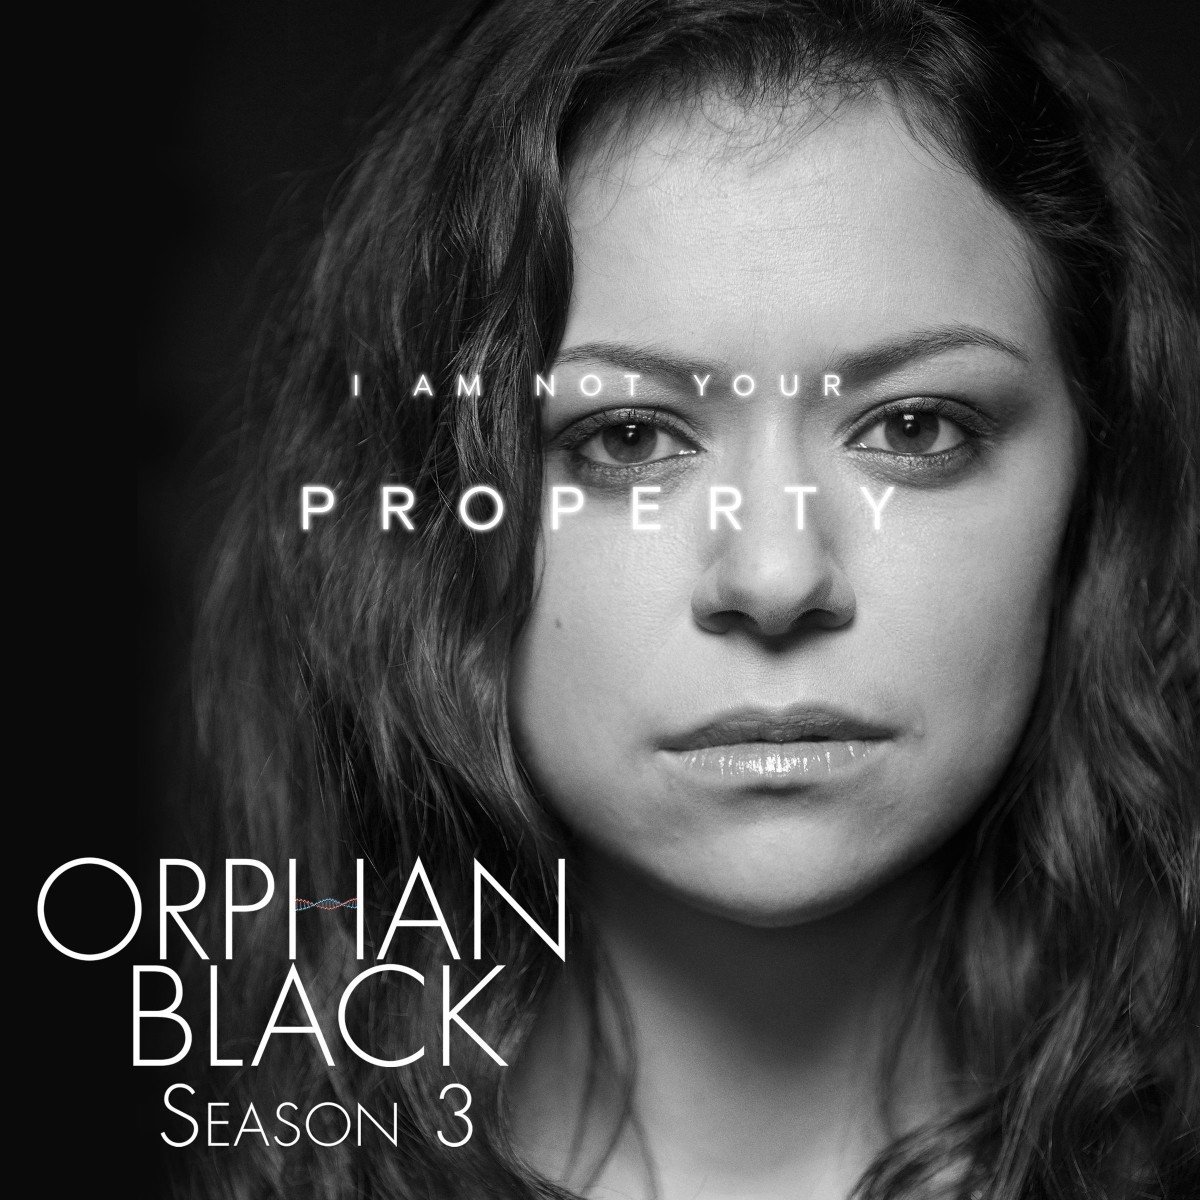 Orphan Black BBC America Promos - Television Promos